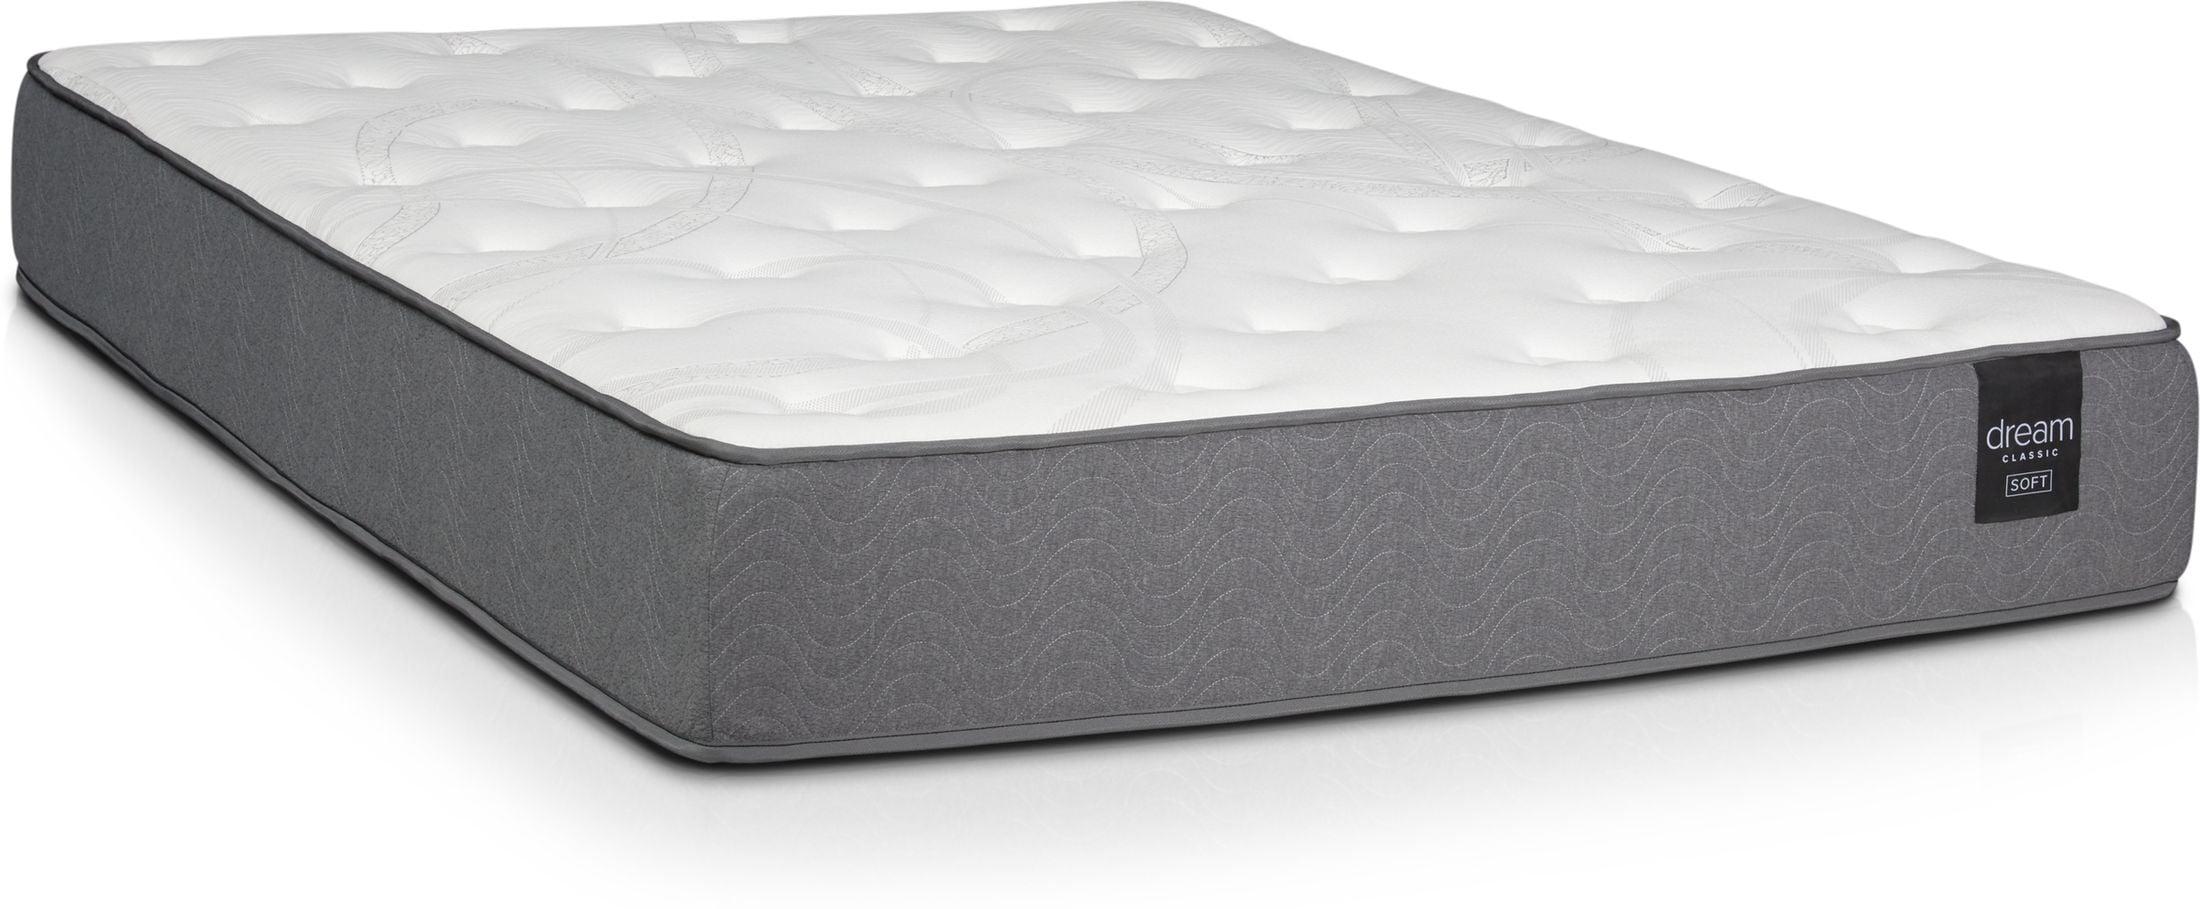 Mattresses and Bedding - Dream-In-A-Box Classic Soft Mattress